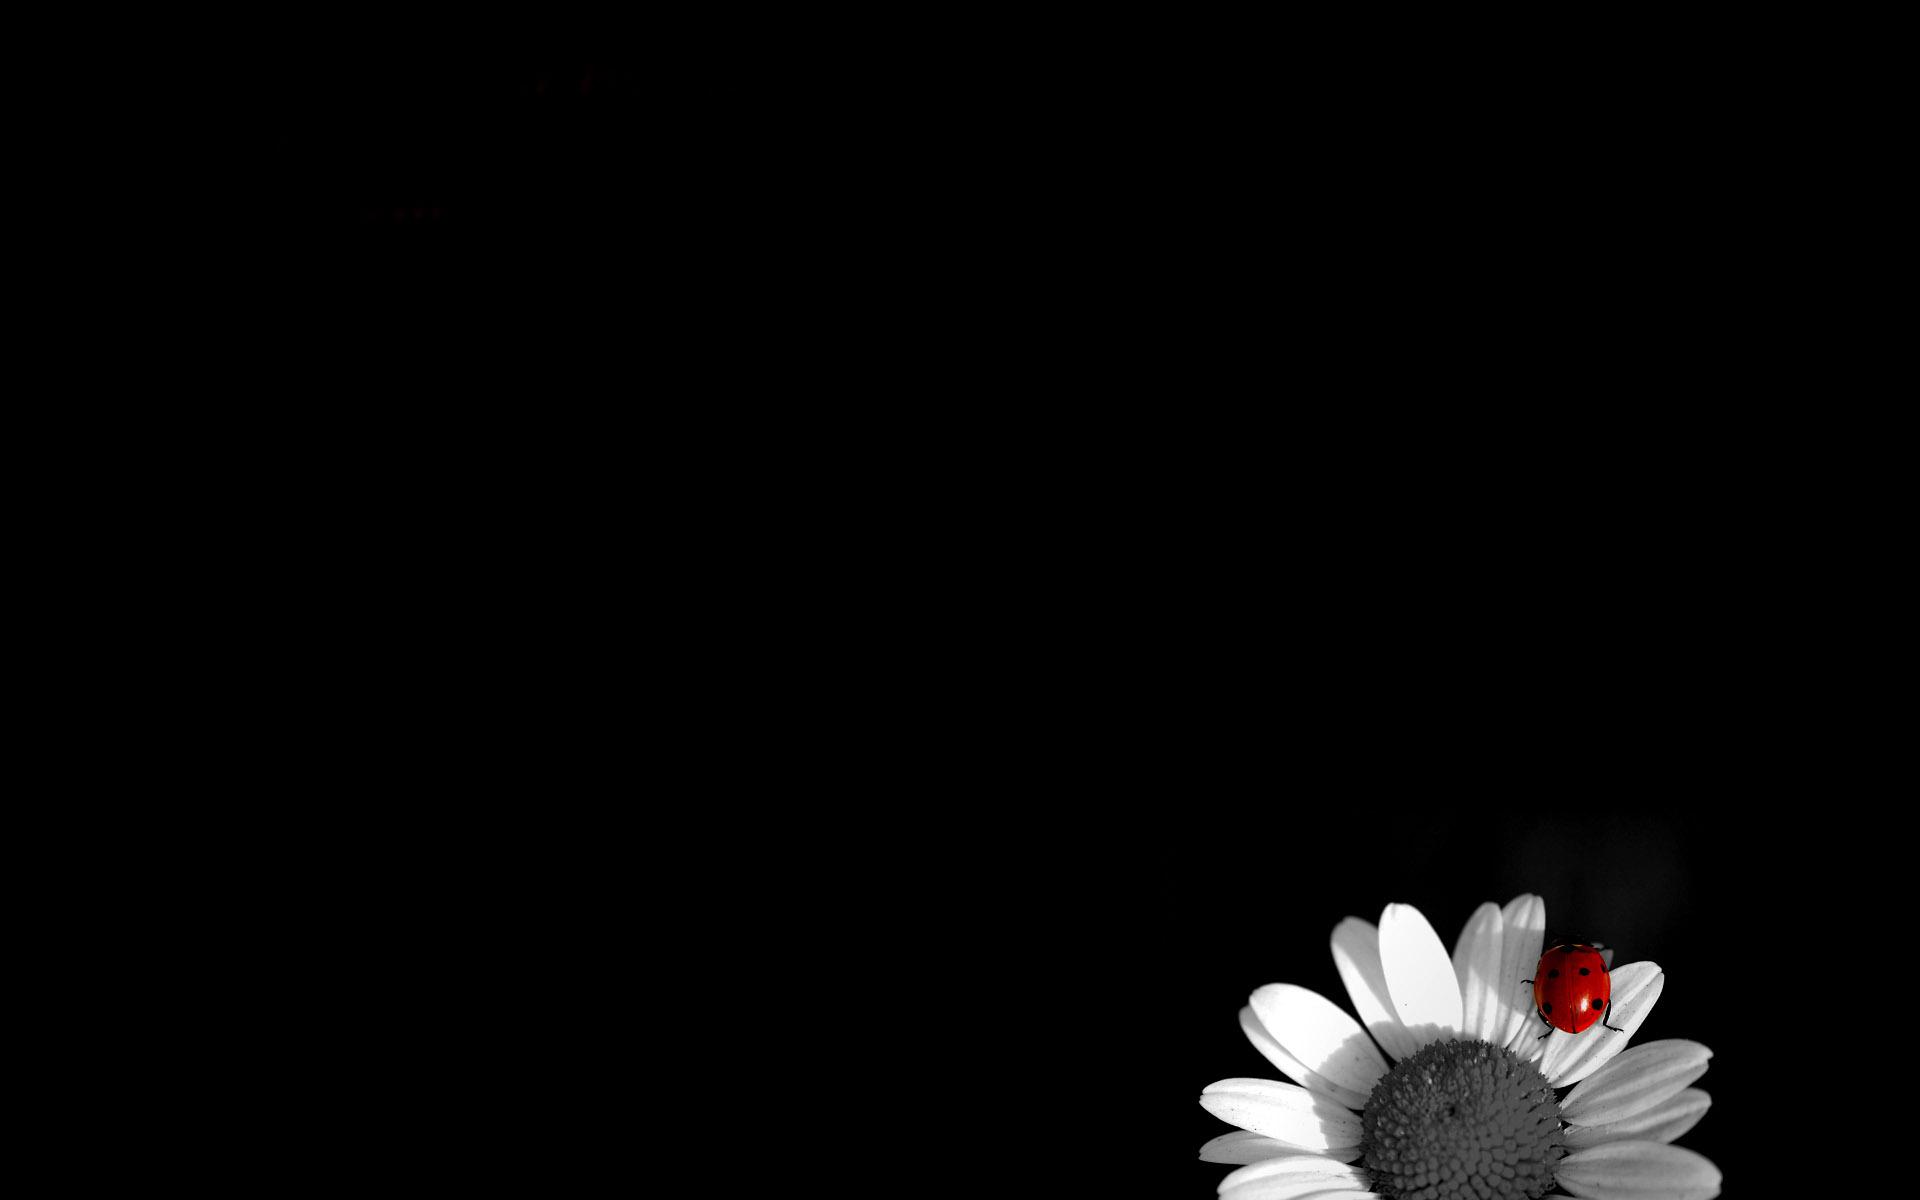 black-wallpaper-8.jpg